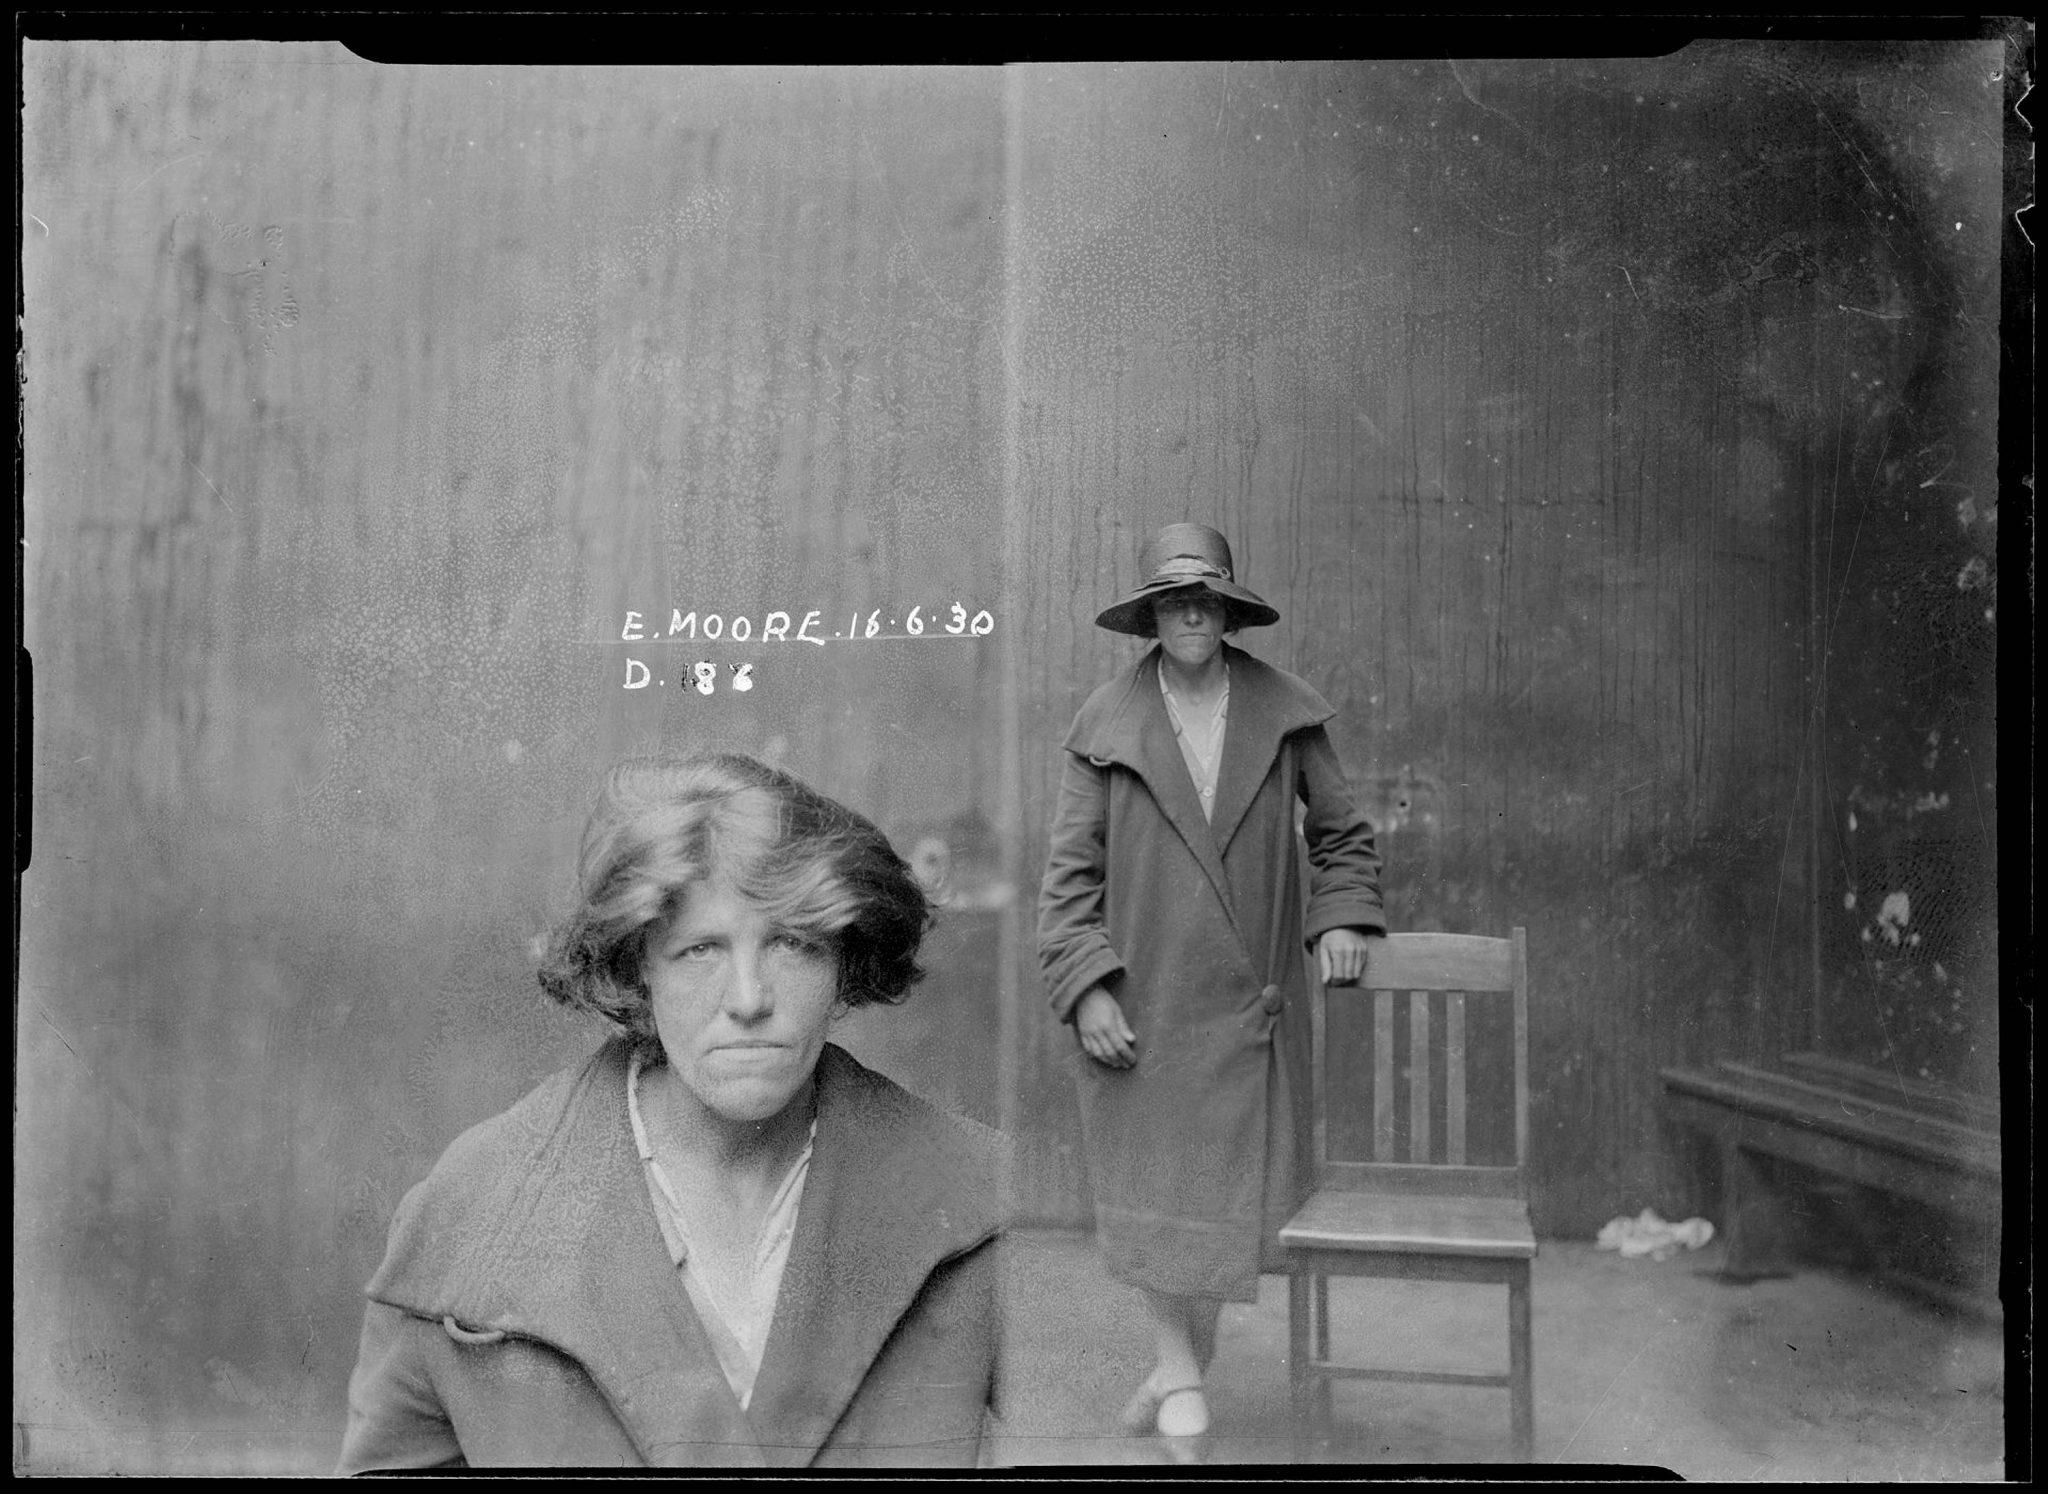 Vintage-Australian-Mugshot-Photograph-26